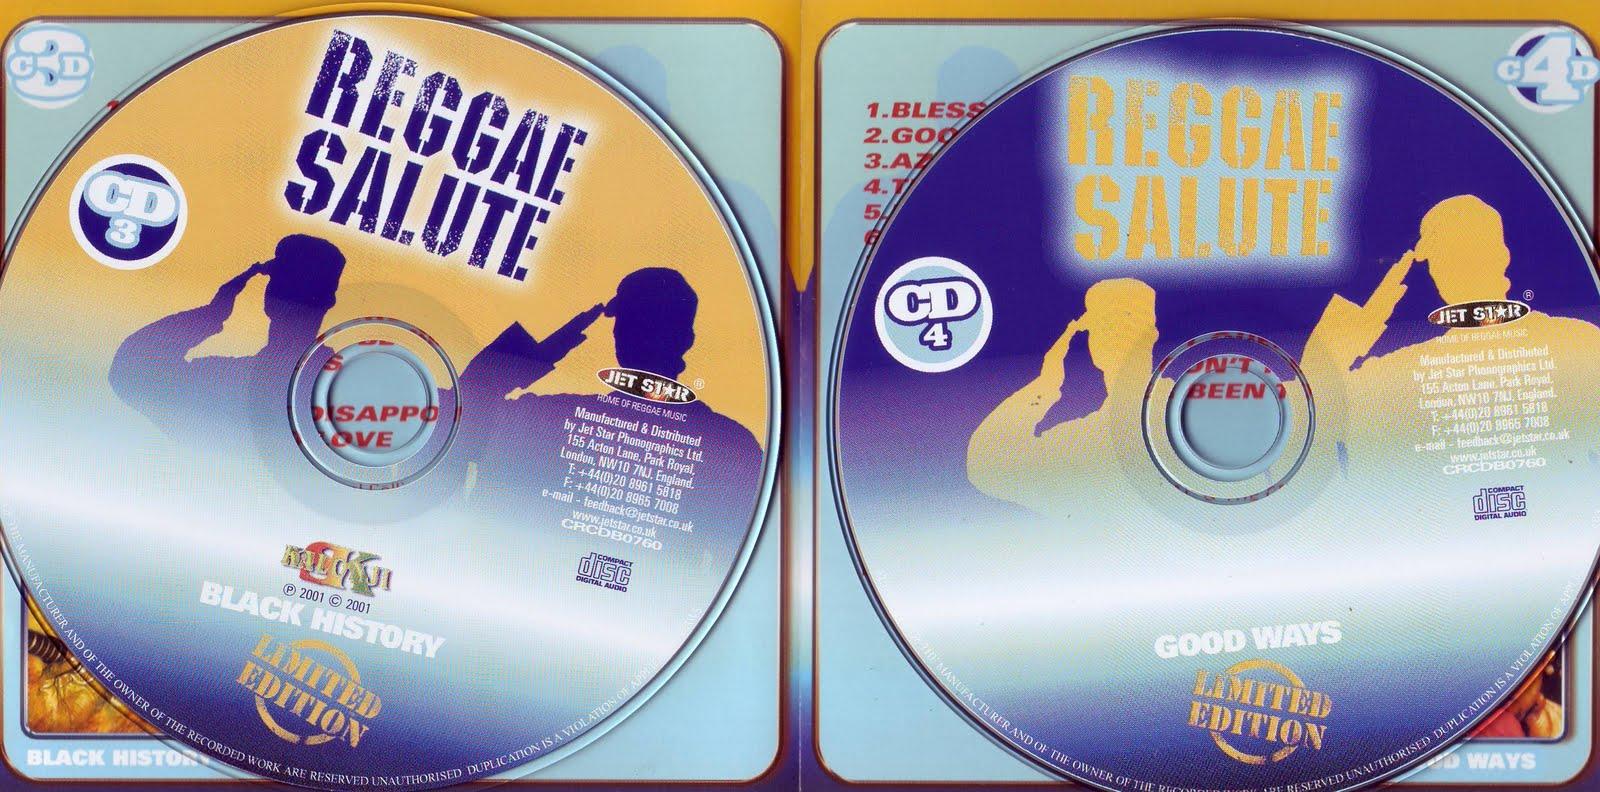 Sizzla.Reggae.Salute.Boxset.Retail.2007